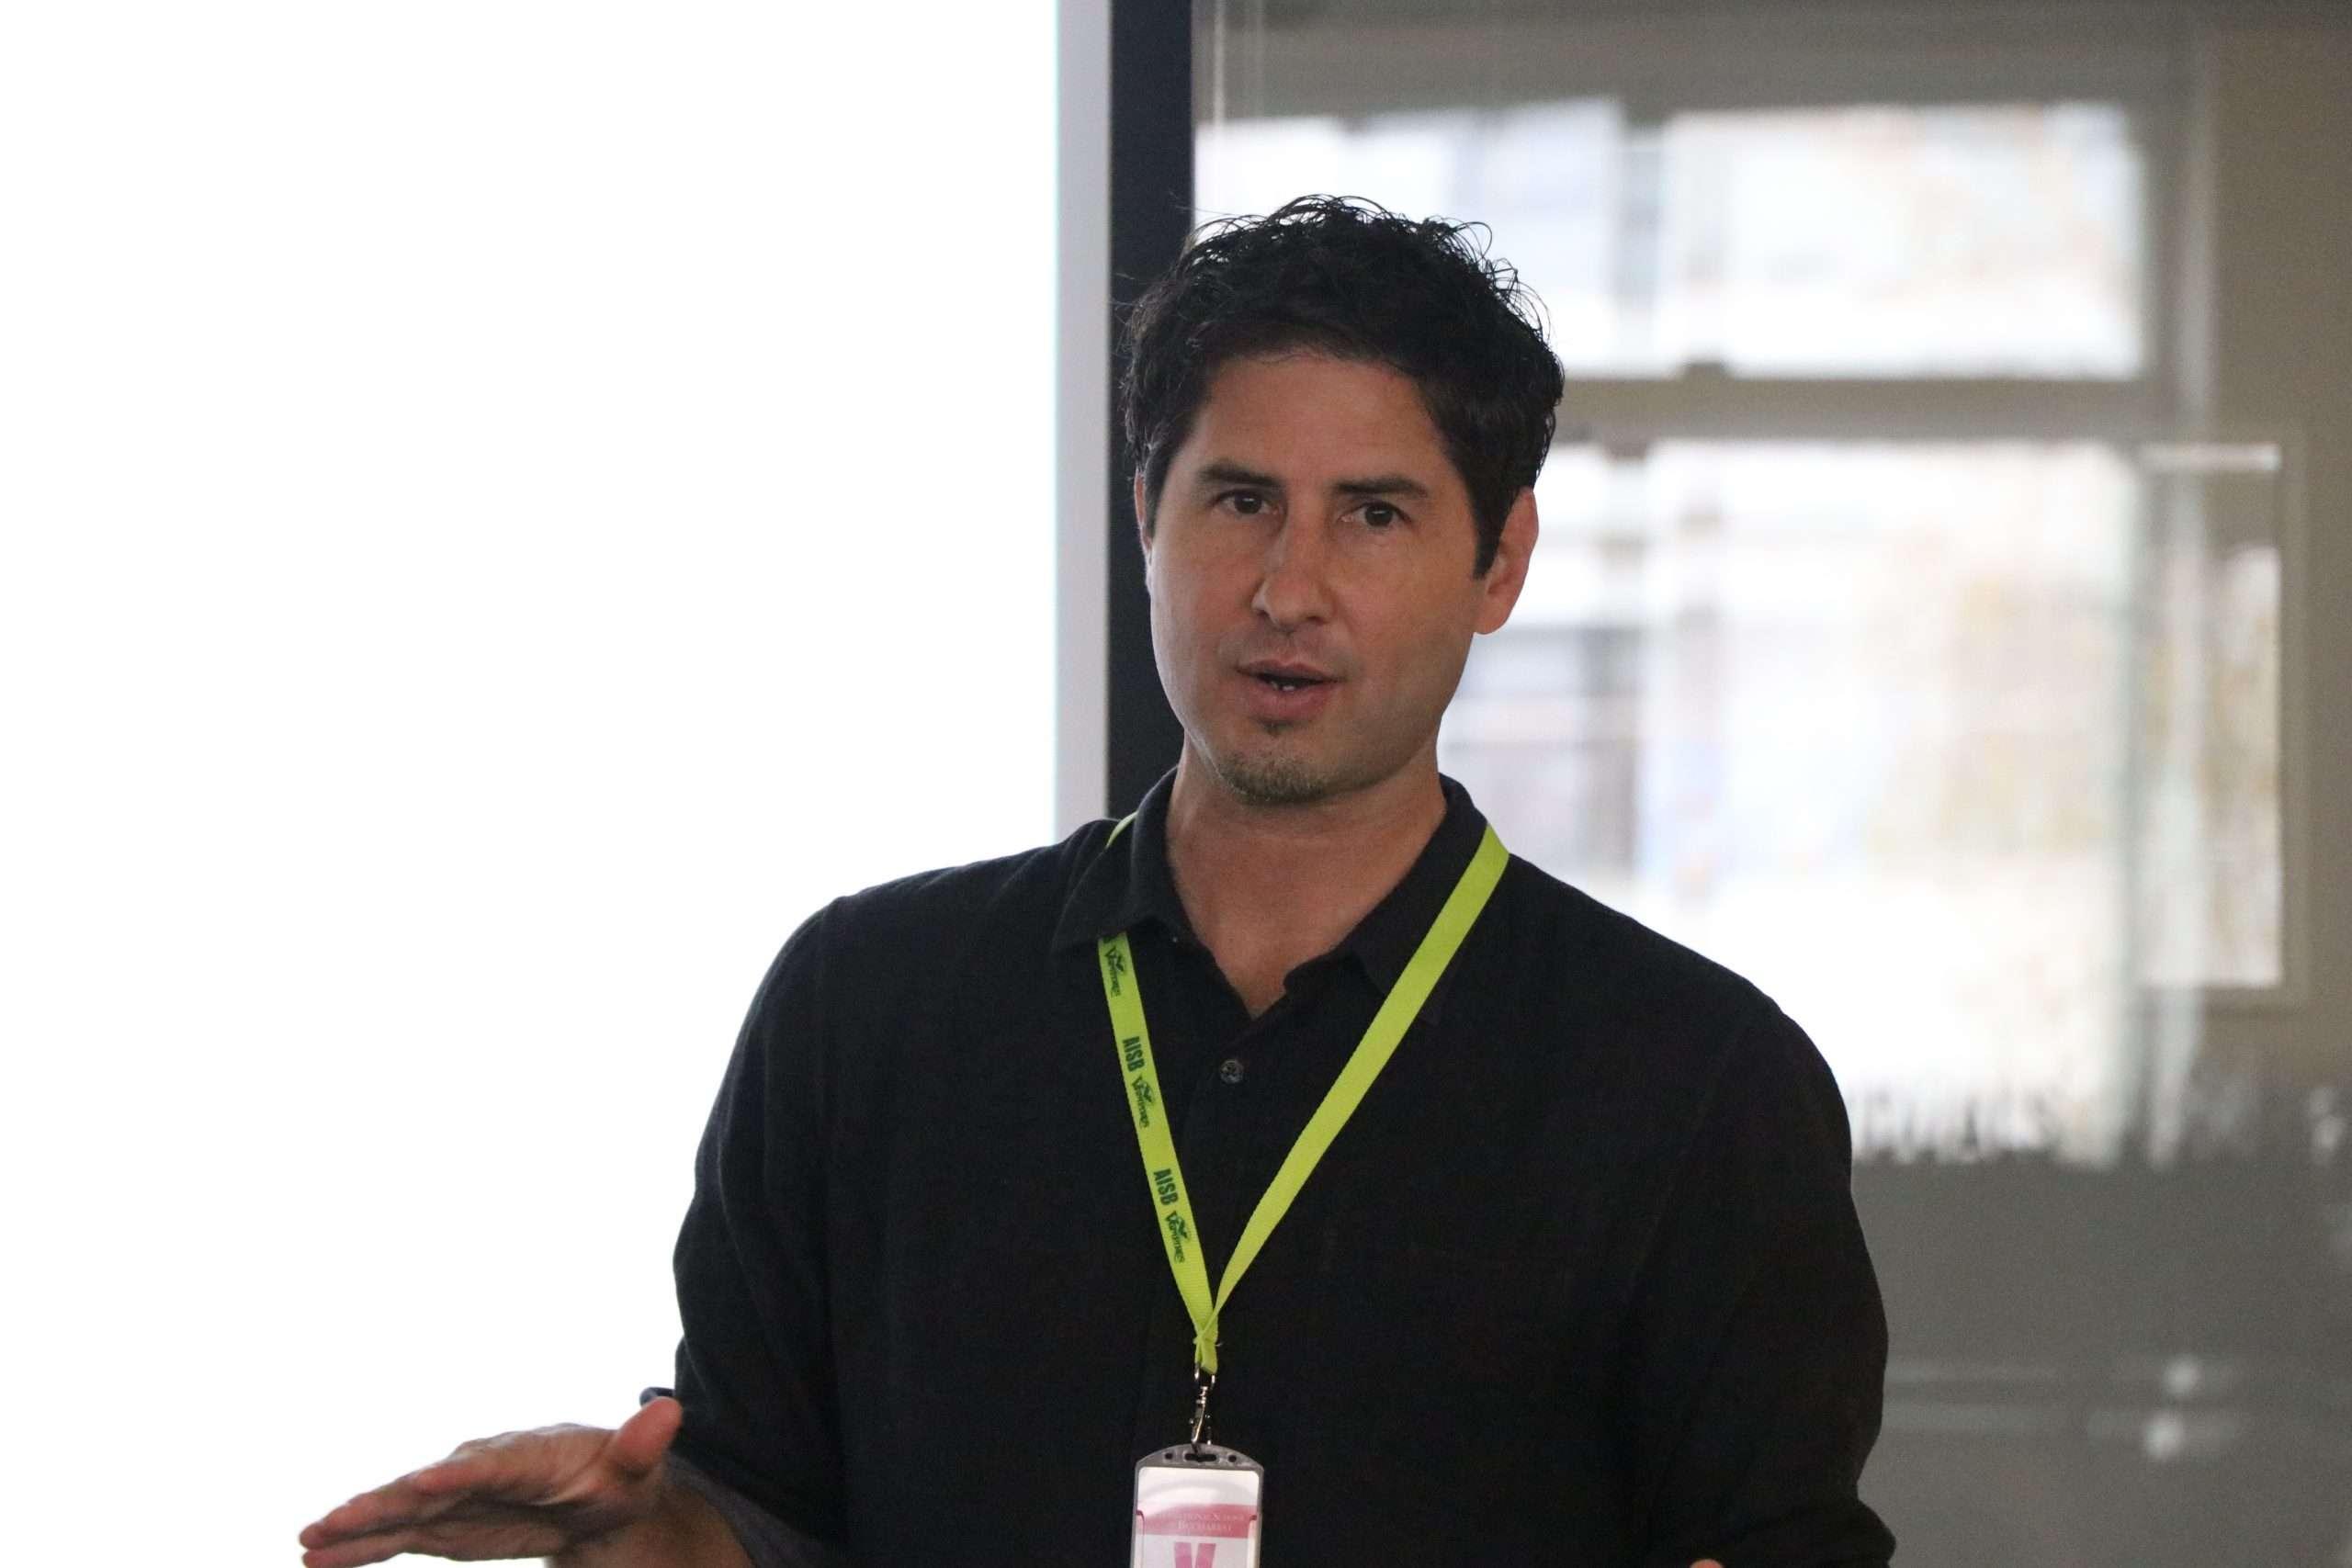 Award-Winning Author Matt de la Peña Visits AISB